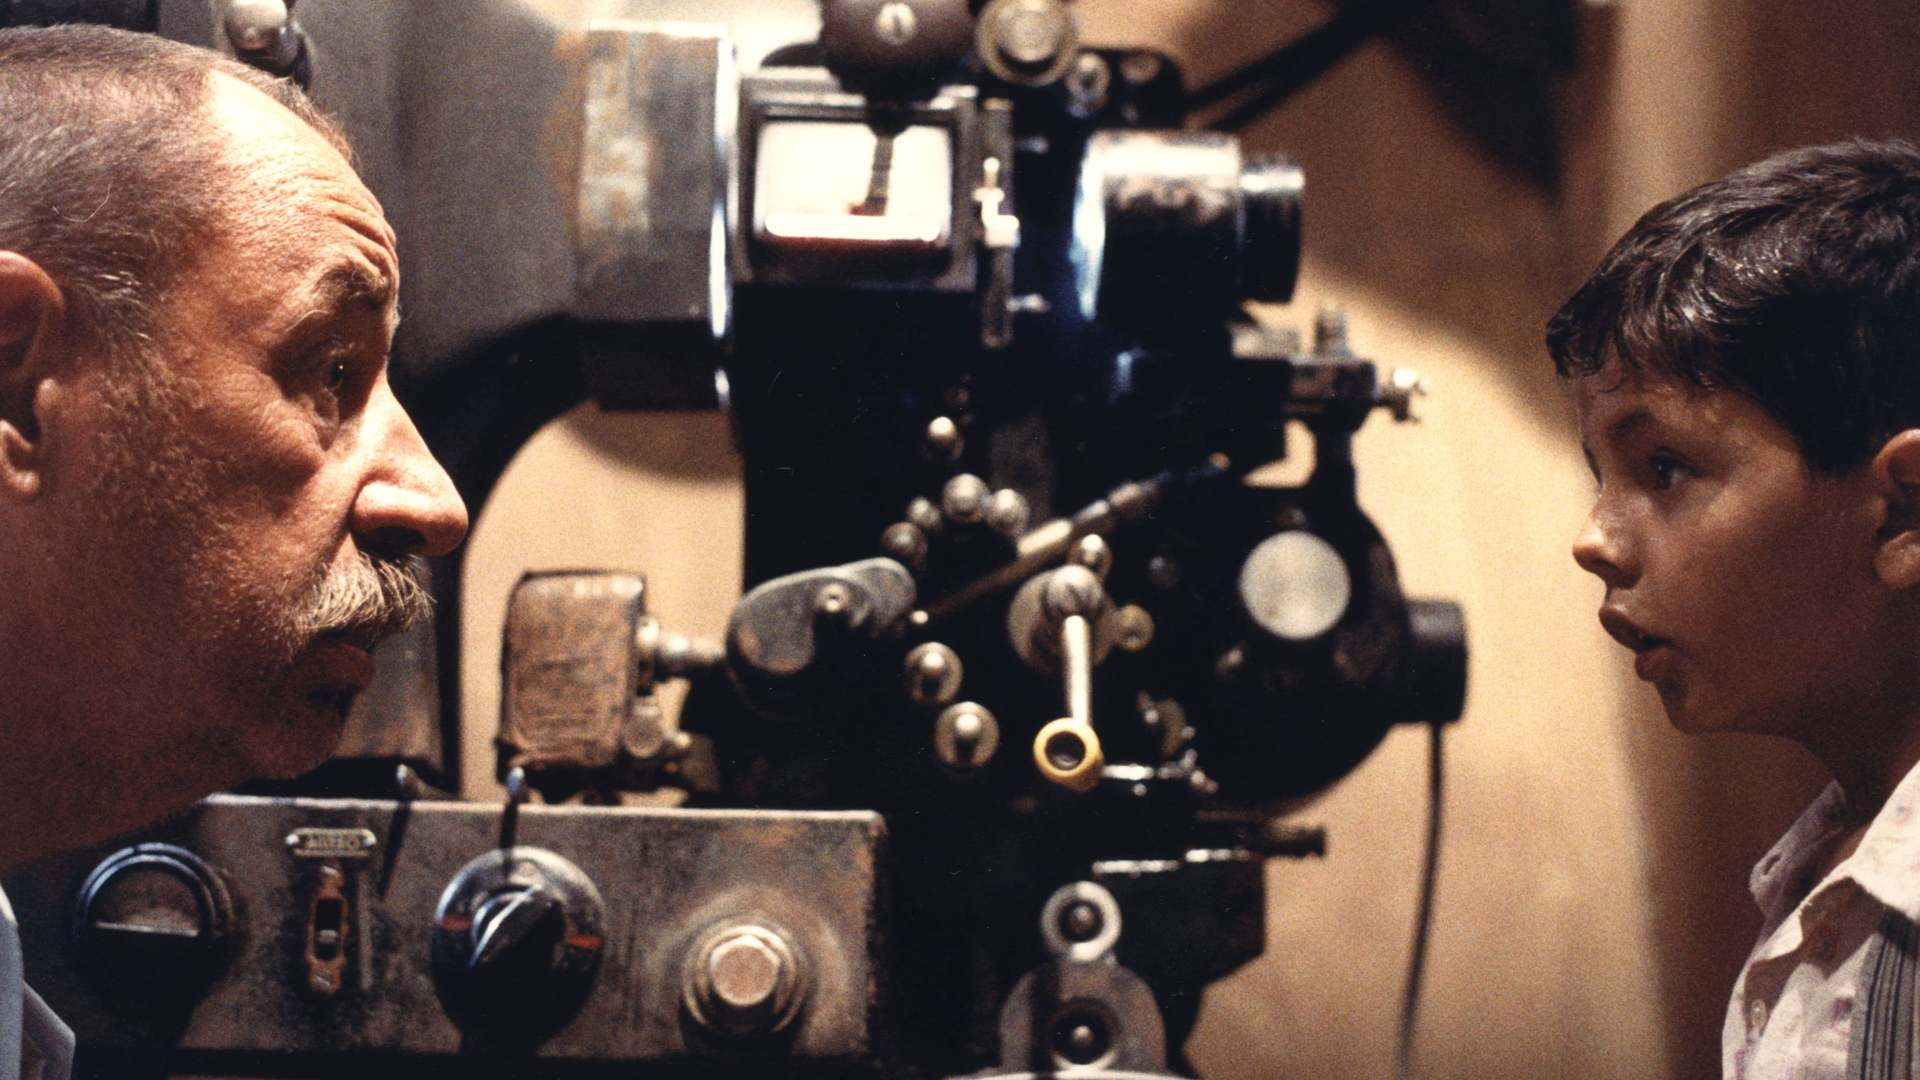 Кадры из фильма Новый кинотеатр «Парадизо» Nuovo Cinema Paradiso 1988